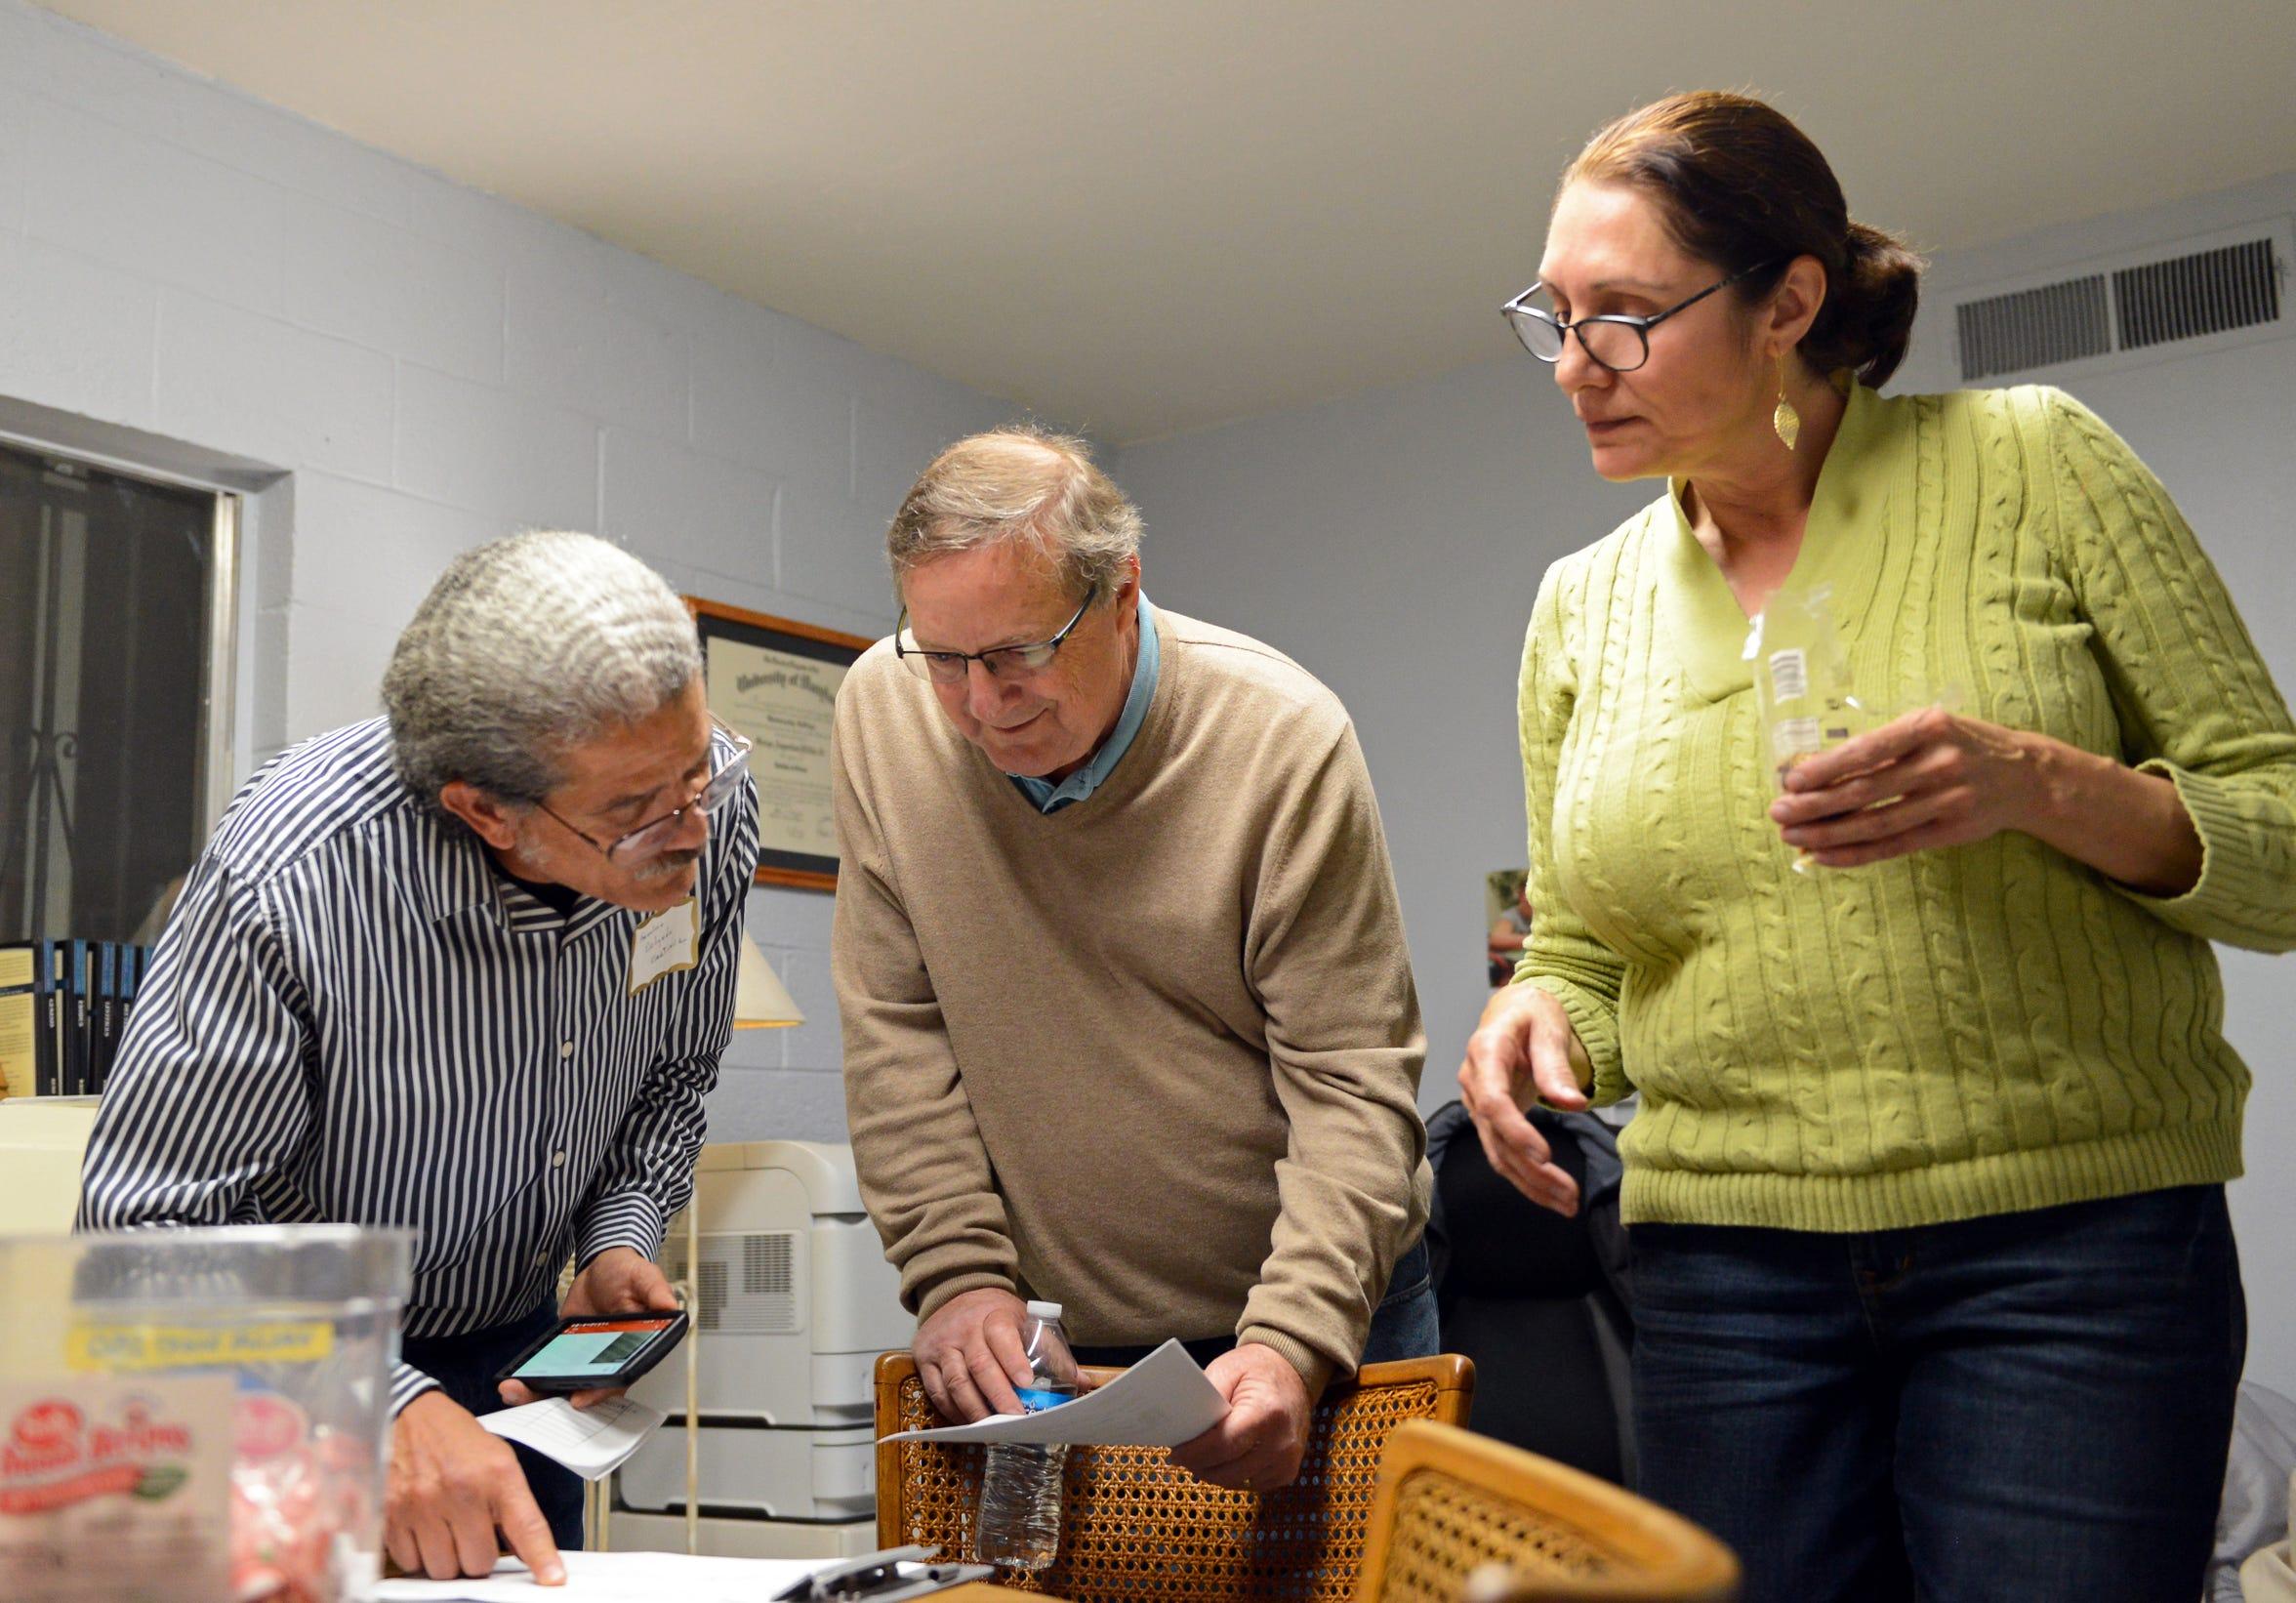 Anselmo Delgado-Martinez, left, speaks to George Miller, pastor at  El Calvario Methodist church in Las Cruces, center, and a volunteer in December 2018.